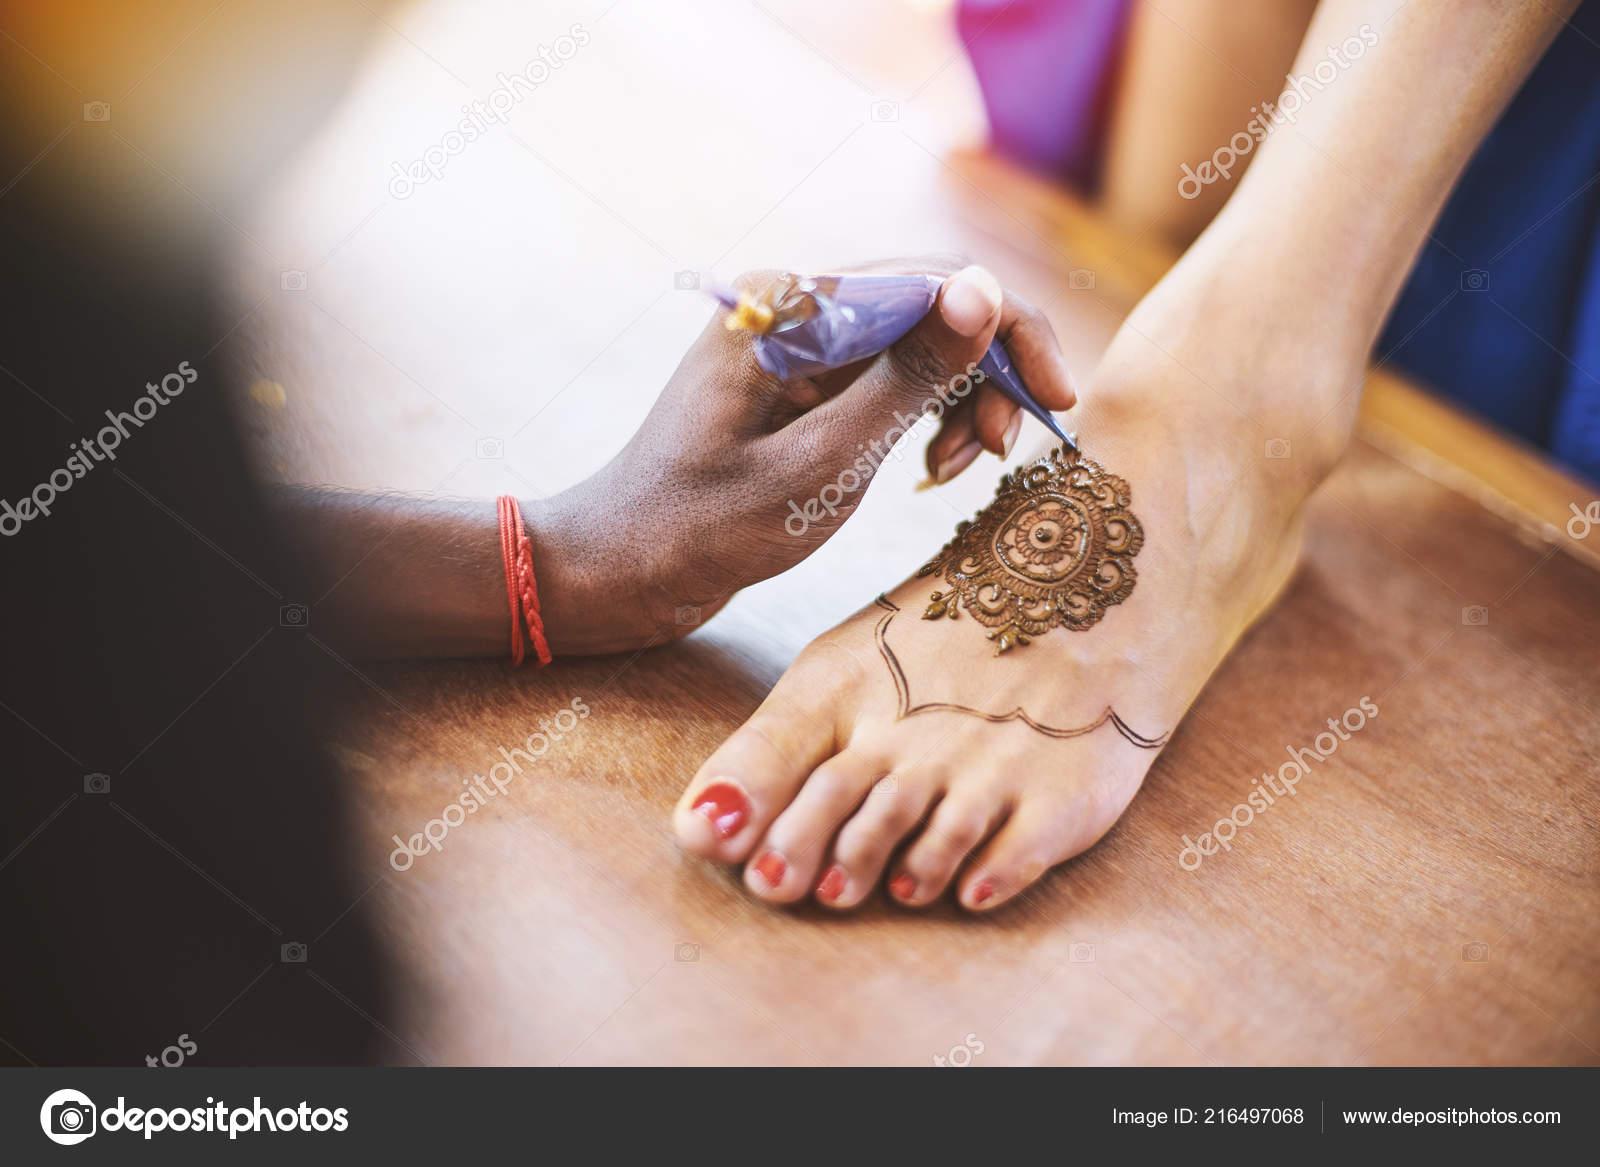 Artista Henna Indio Dibujo Arte Del Tatuaje Mehndi Los Pies Fotos